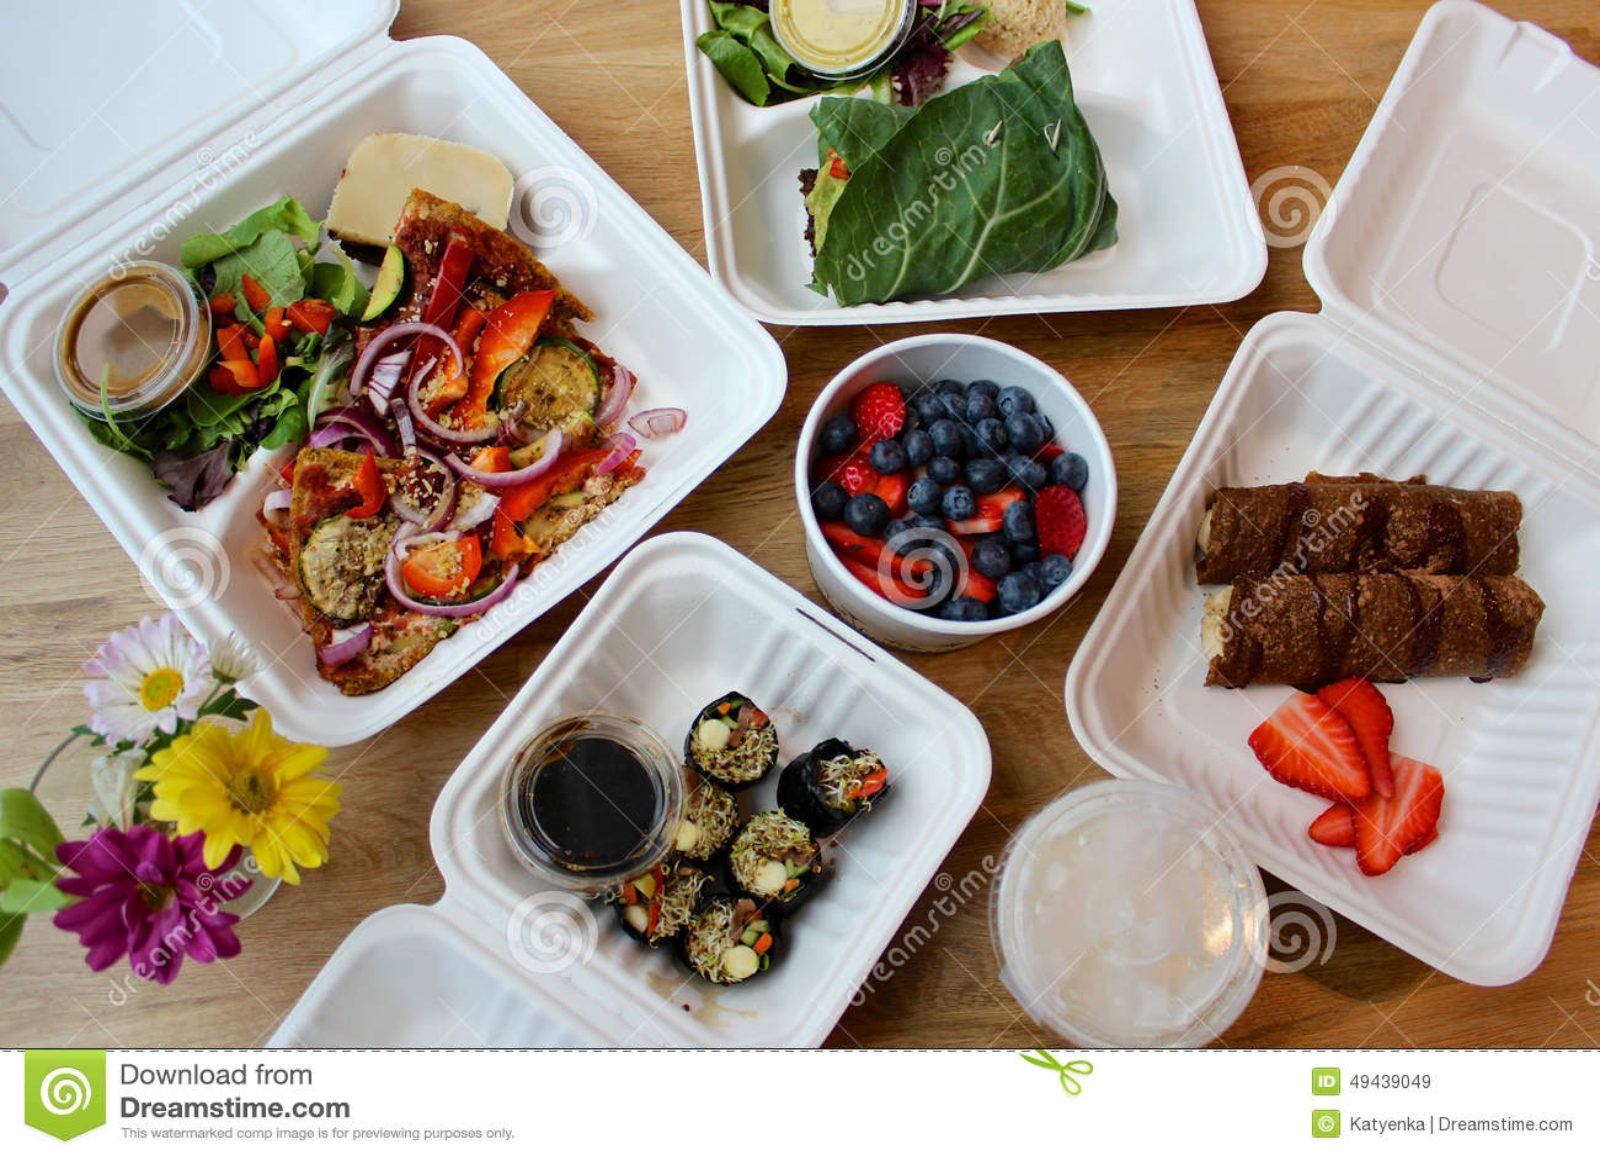 Raw Vegan Food Delivery